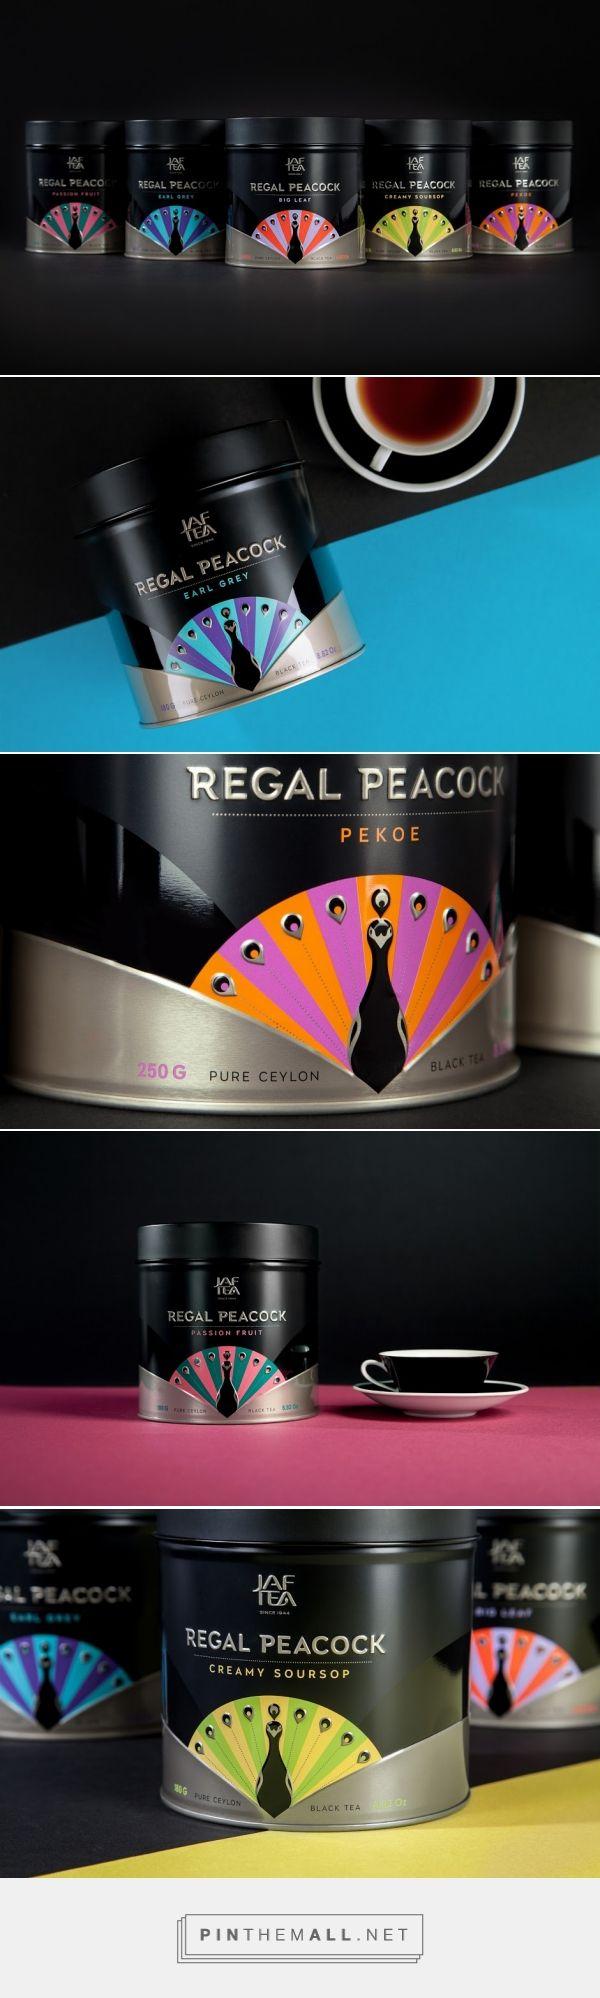 Regal Peacock tea packaging design by Openmint (Russia) - http://www.packagingoftheworld.com/2016/04/regal-peacock.html